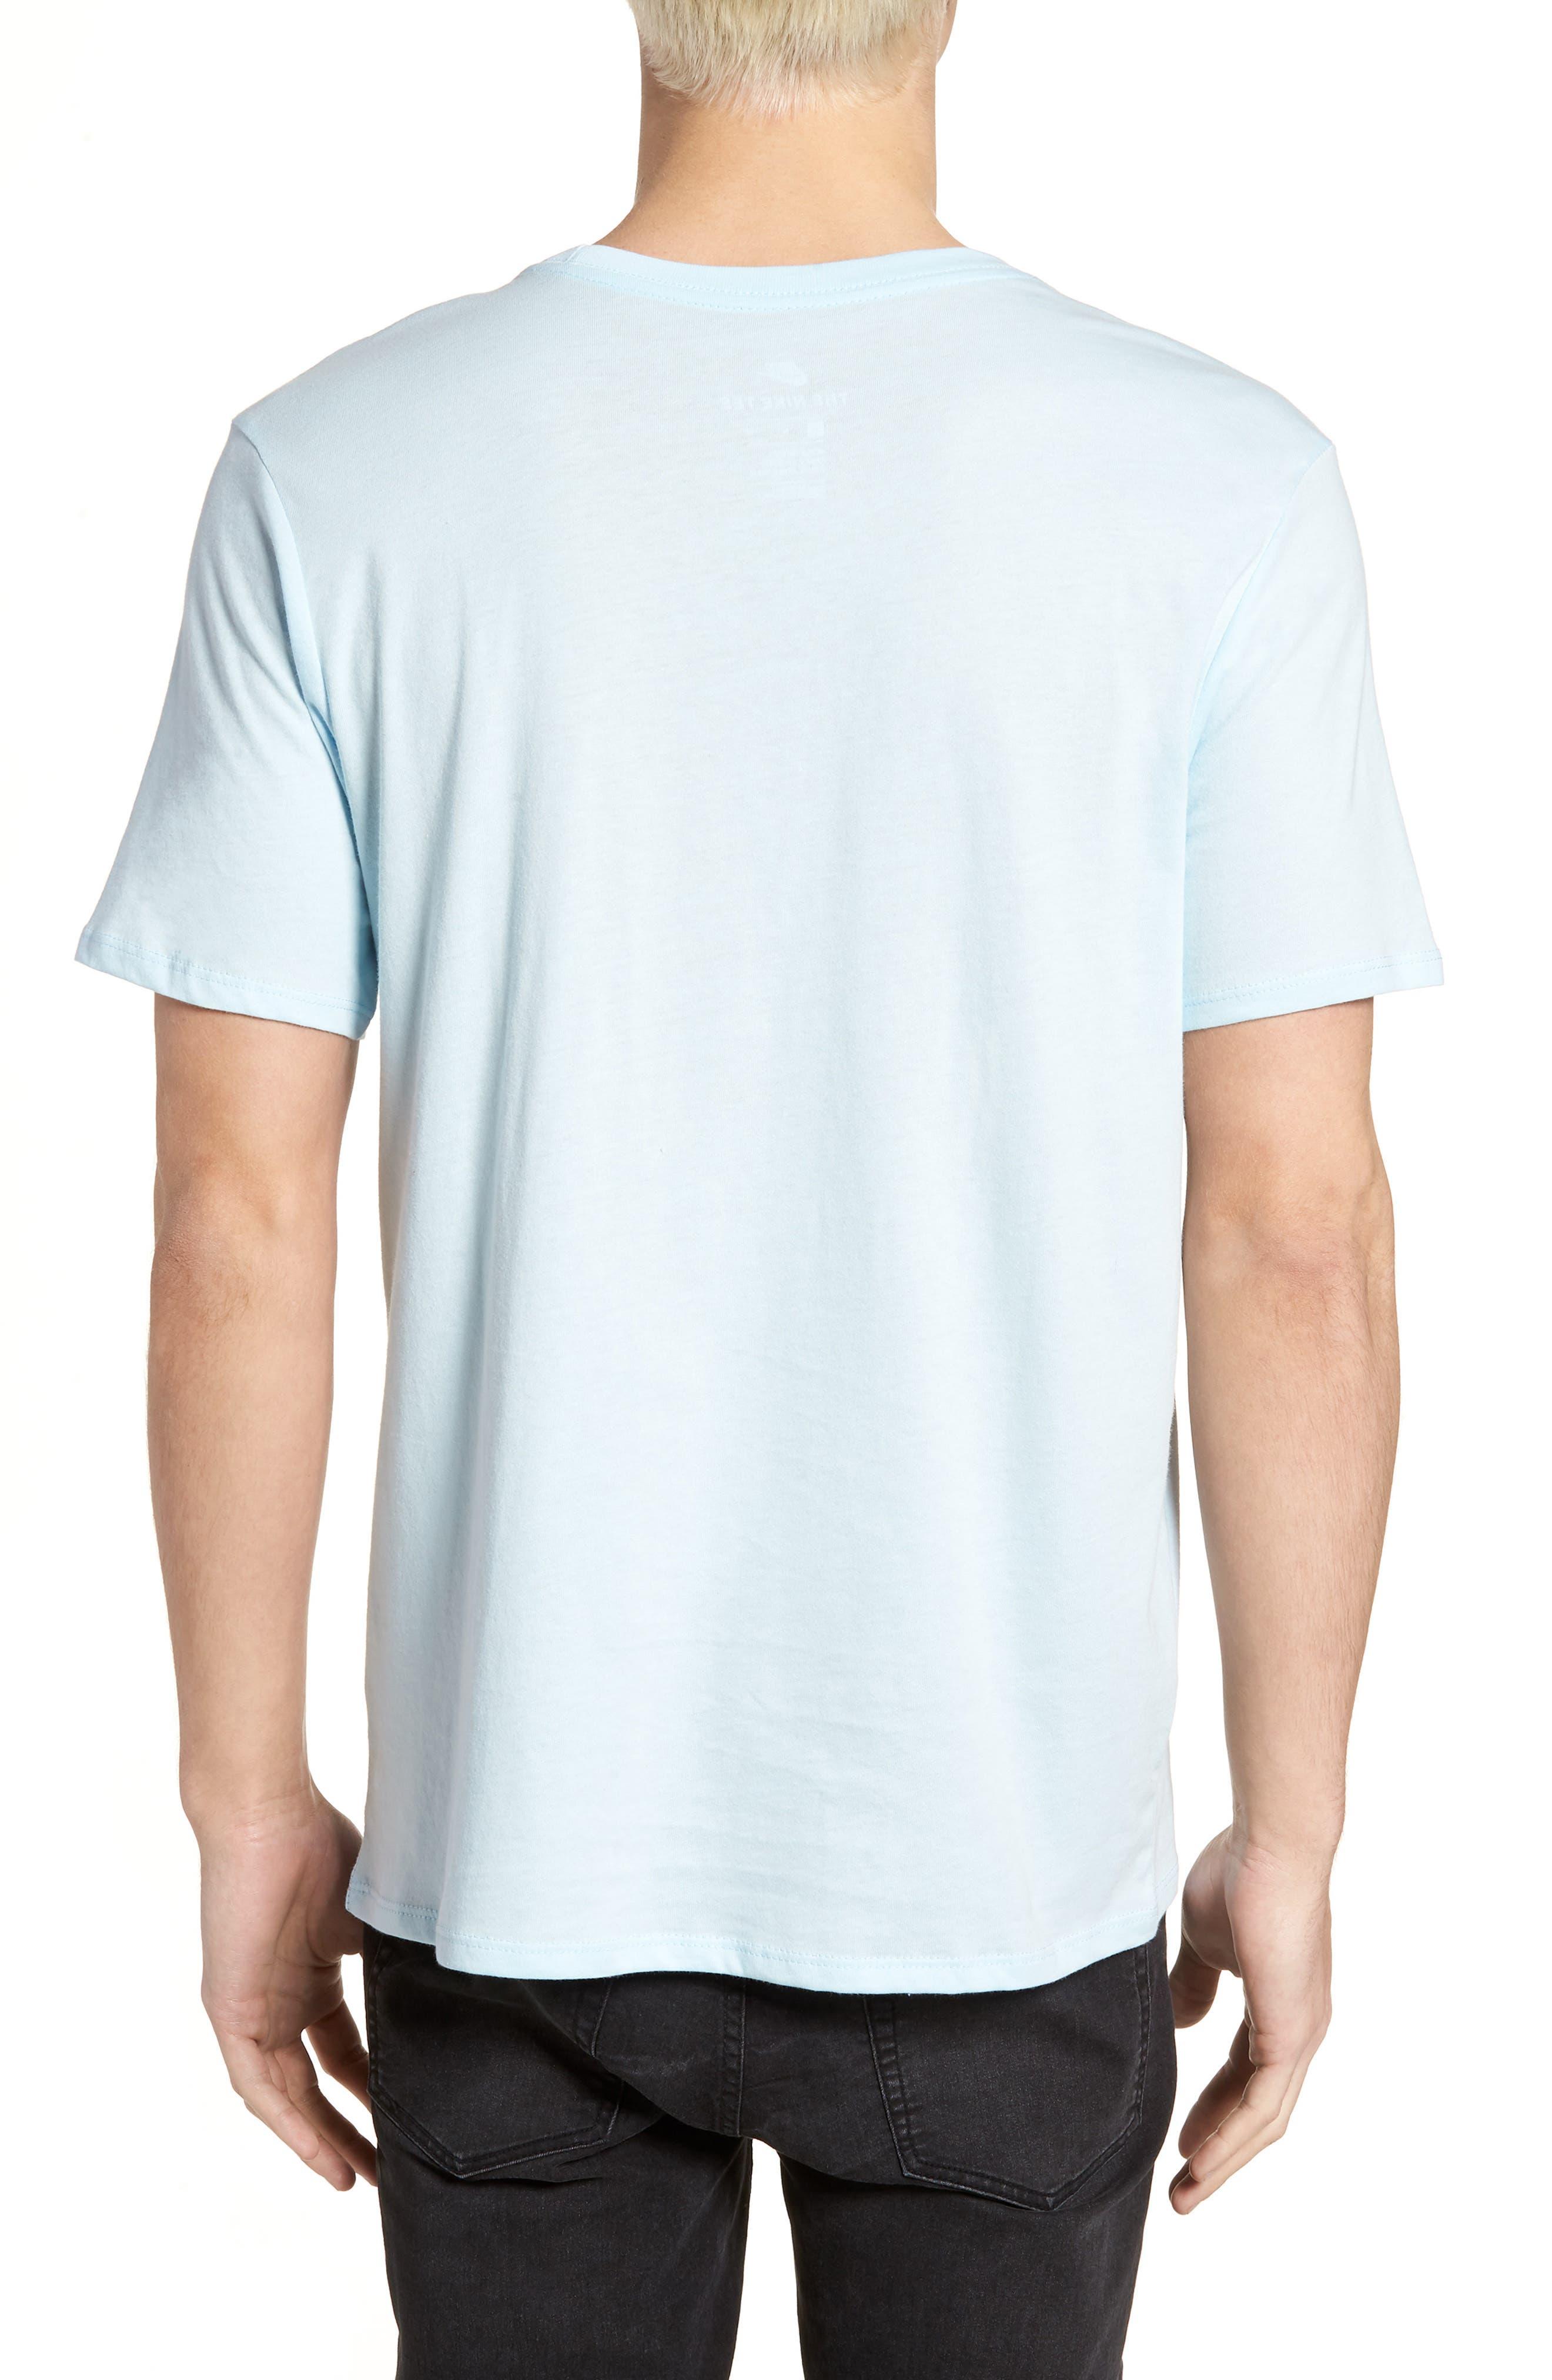 Concept Graphic T-Shirt,                             Alternate thumbnail 2, color,                             Cobalt Tint/ Illusion Green